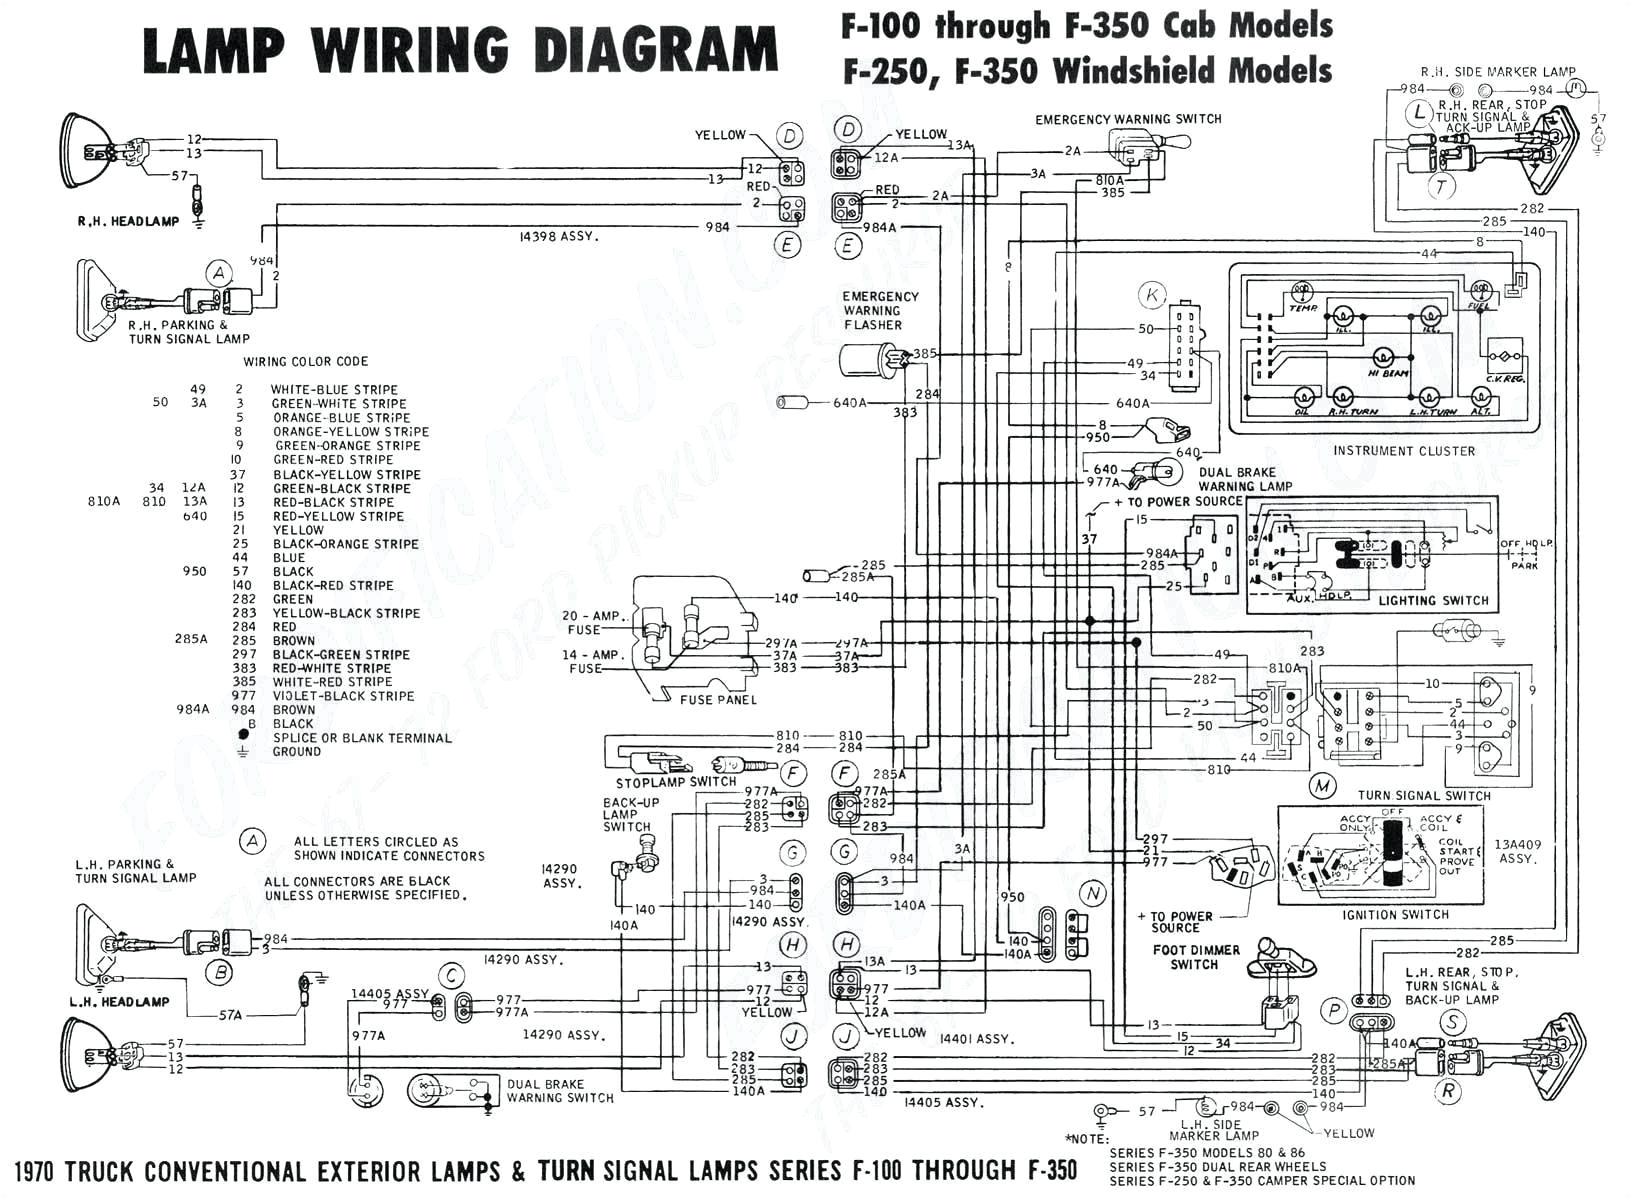 5r110 wiring diagram wiring diagram 5r110w transmission shift solenoid diagram free download wiring